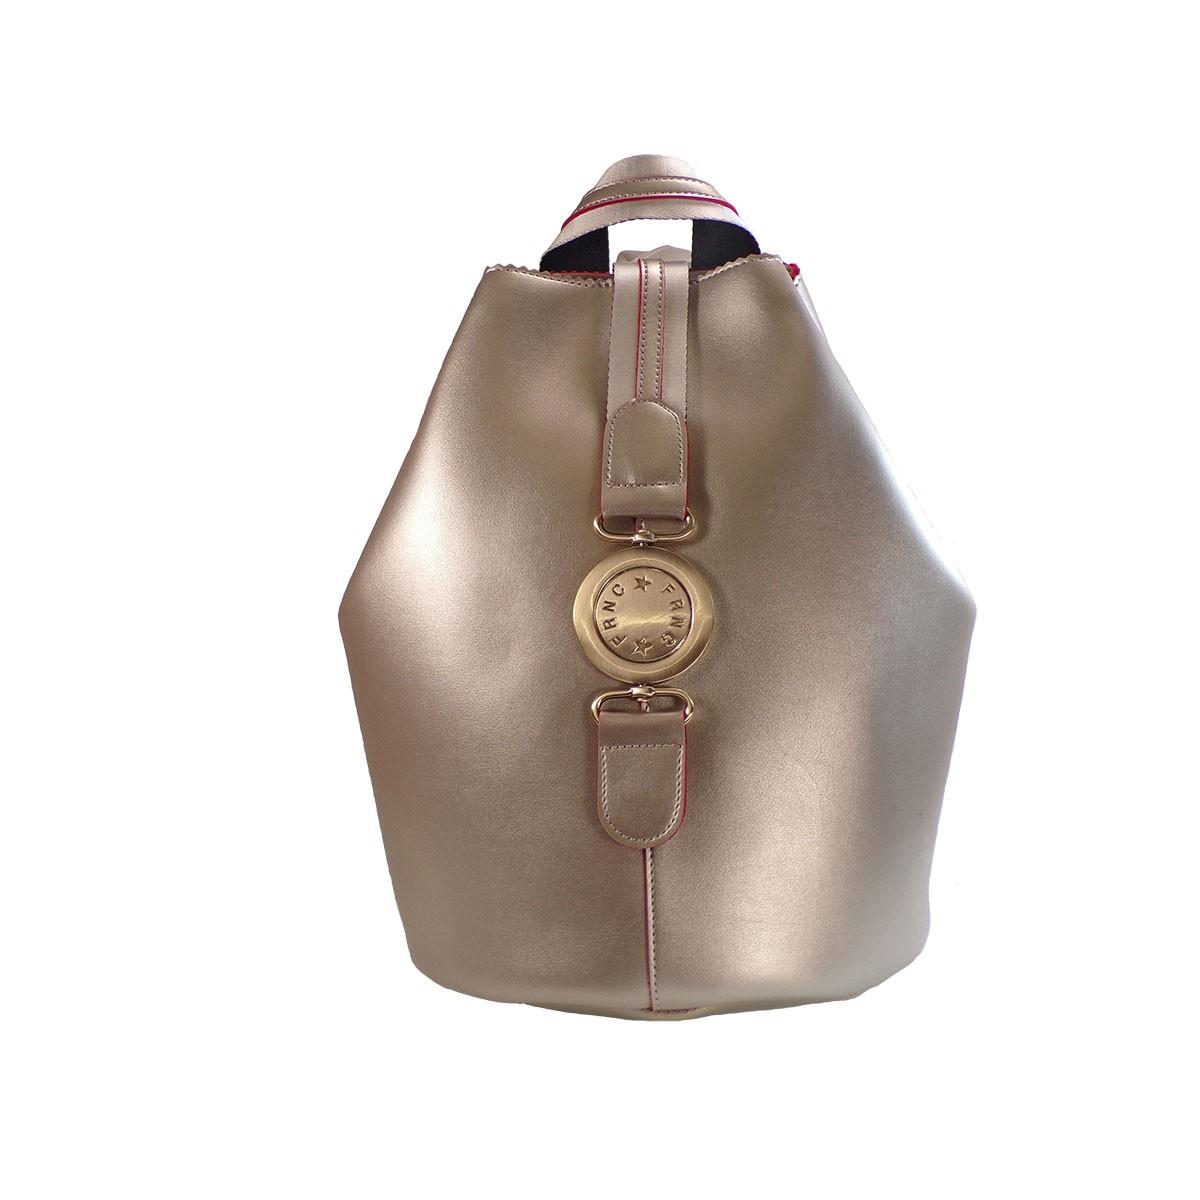 788545ce9b FRNC FRANCESCO Τσάντα Γυναικεία Πλάτης-Backpack 563 Πλατίνα Δέρμα –  IShoeStore